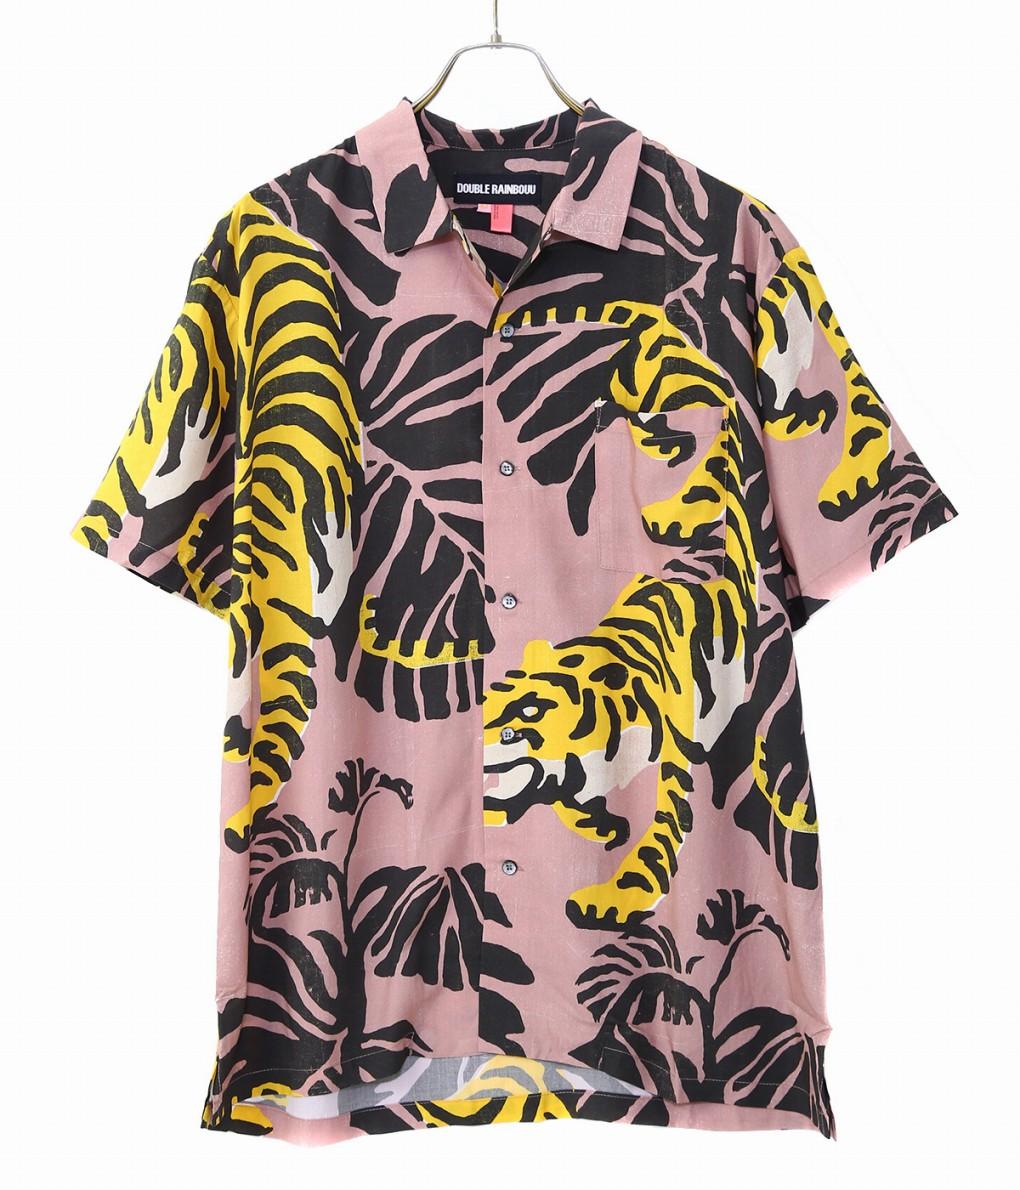 DOUBLE RAINBOUU / ダブルレインボー : NIGHT CRAWLER : ダブル レインボー アロハ 半袖 オープンカラーシャツ メンズ : DRSS0017 【PIE】【REA】